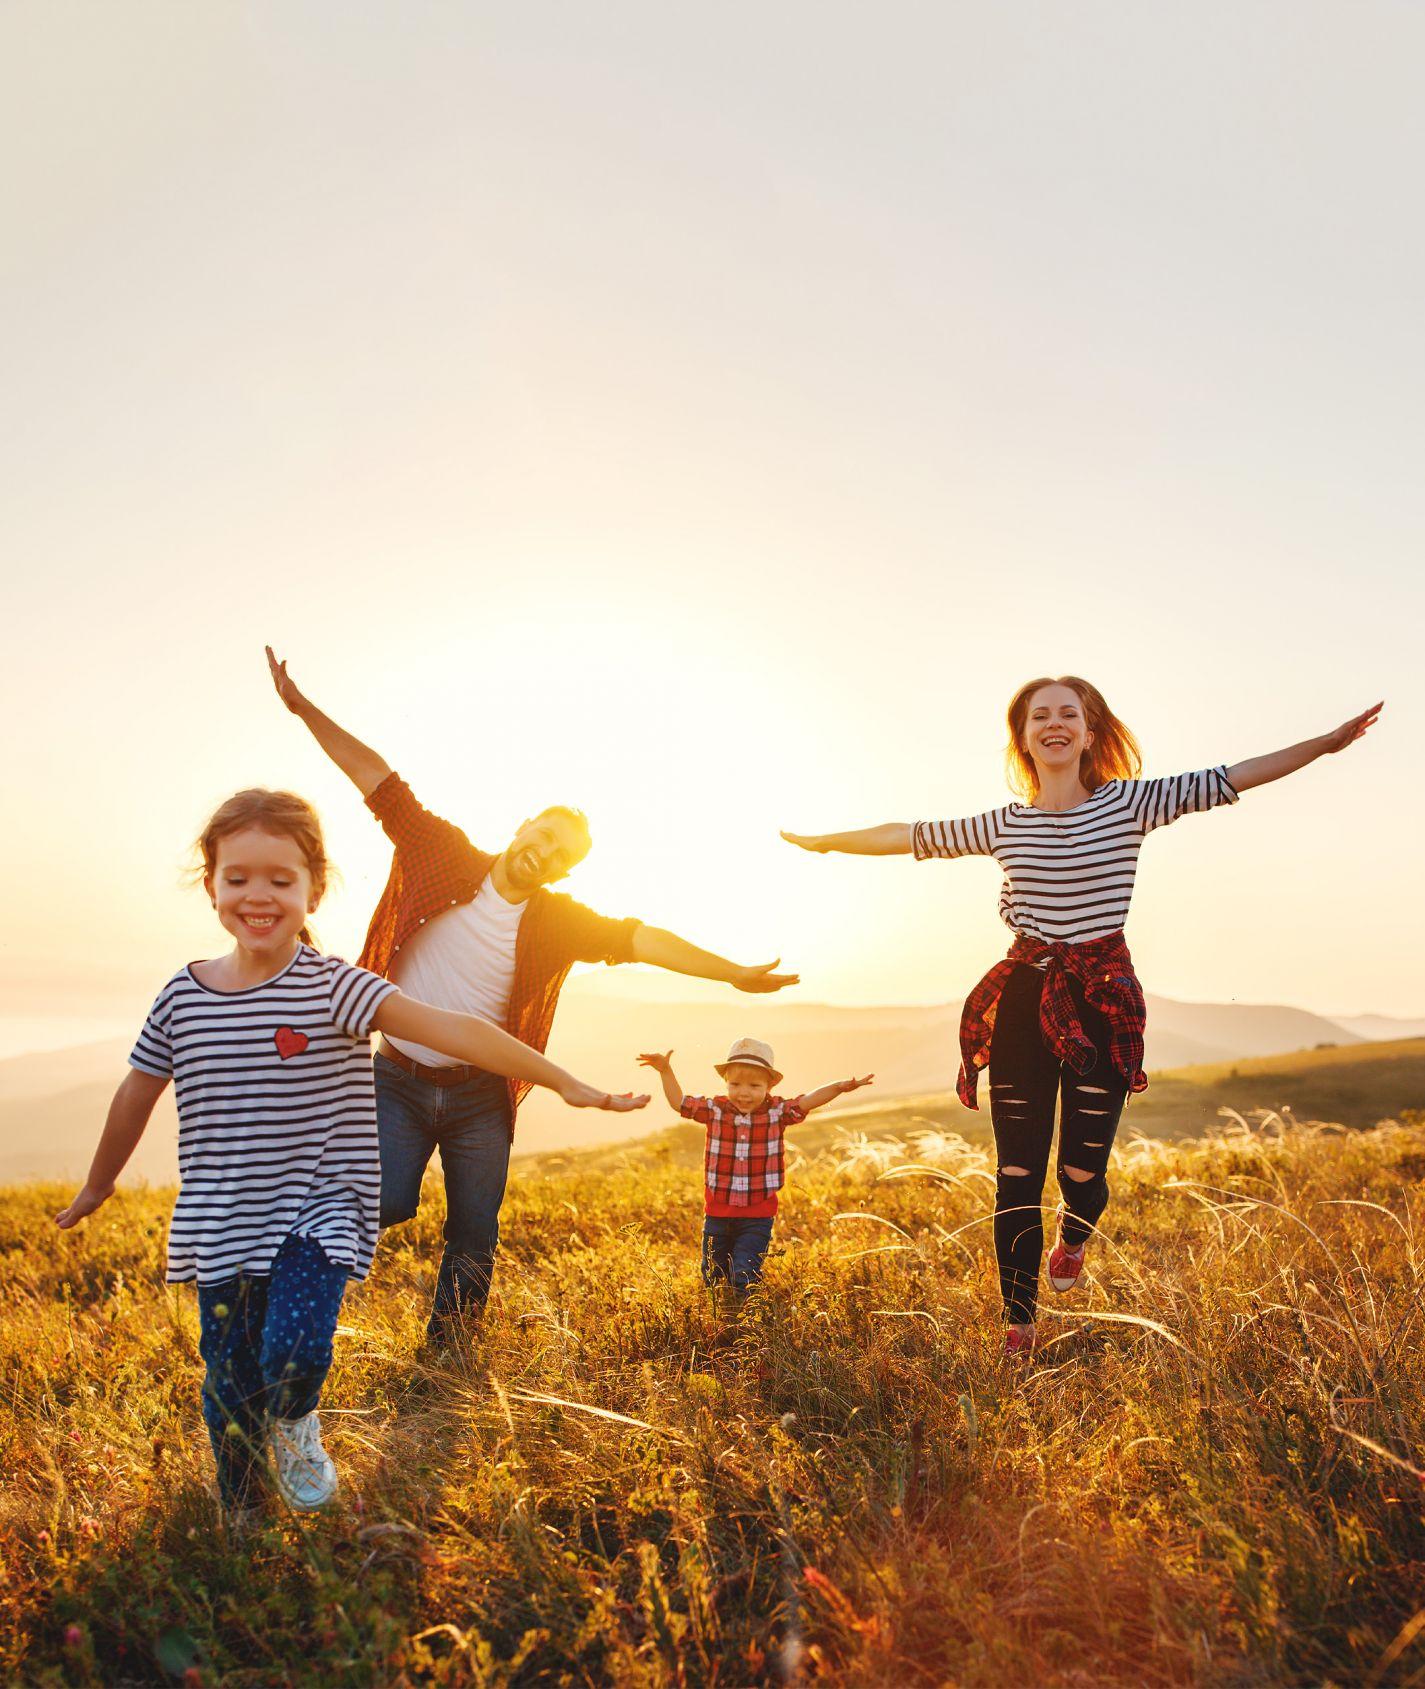 Familie auf einem Feld im Sommer